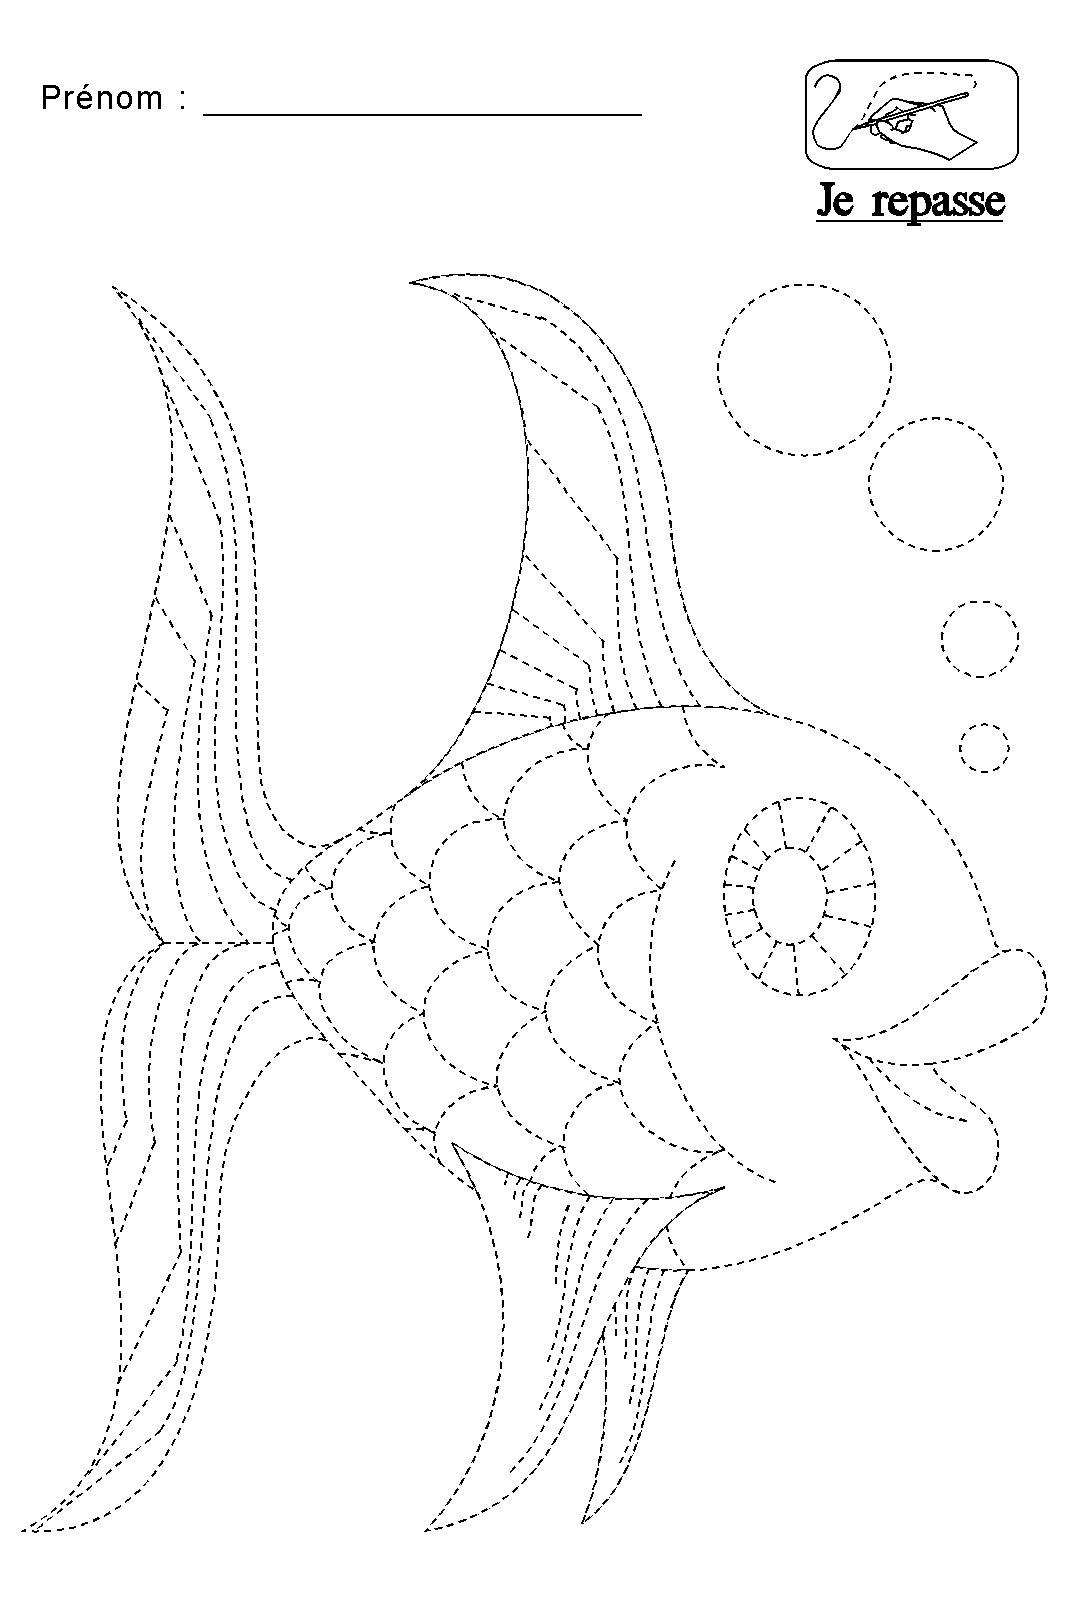 Graphisme repasser les pointill s du poisson - Poisson en maternelle ...